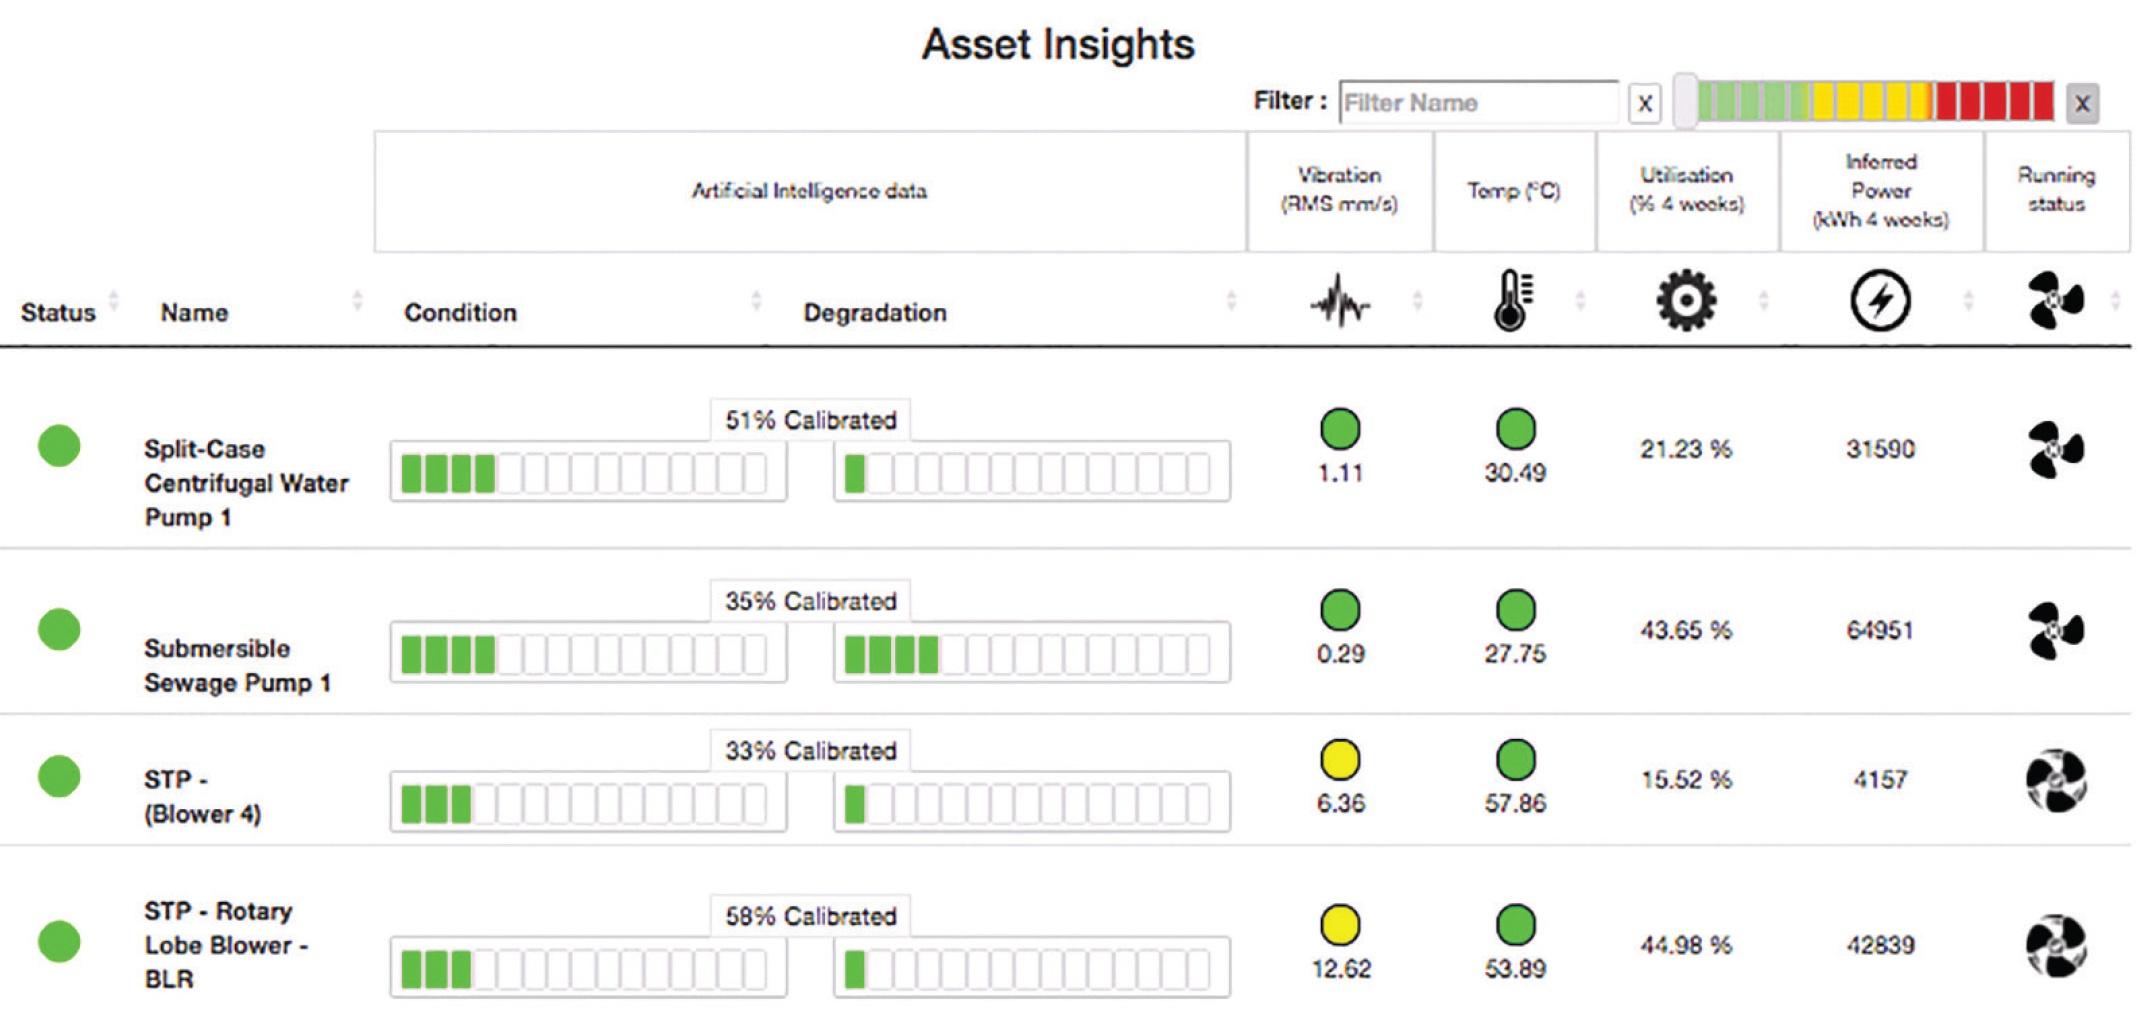 FitMachine Asset insights.jpg